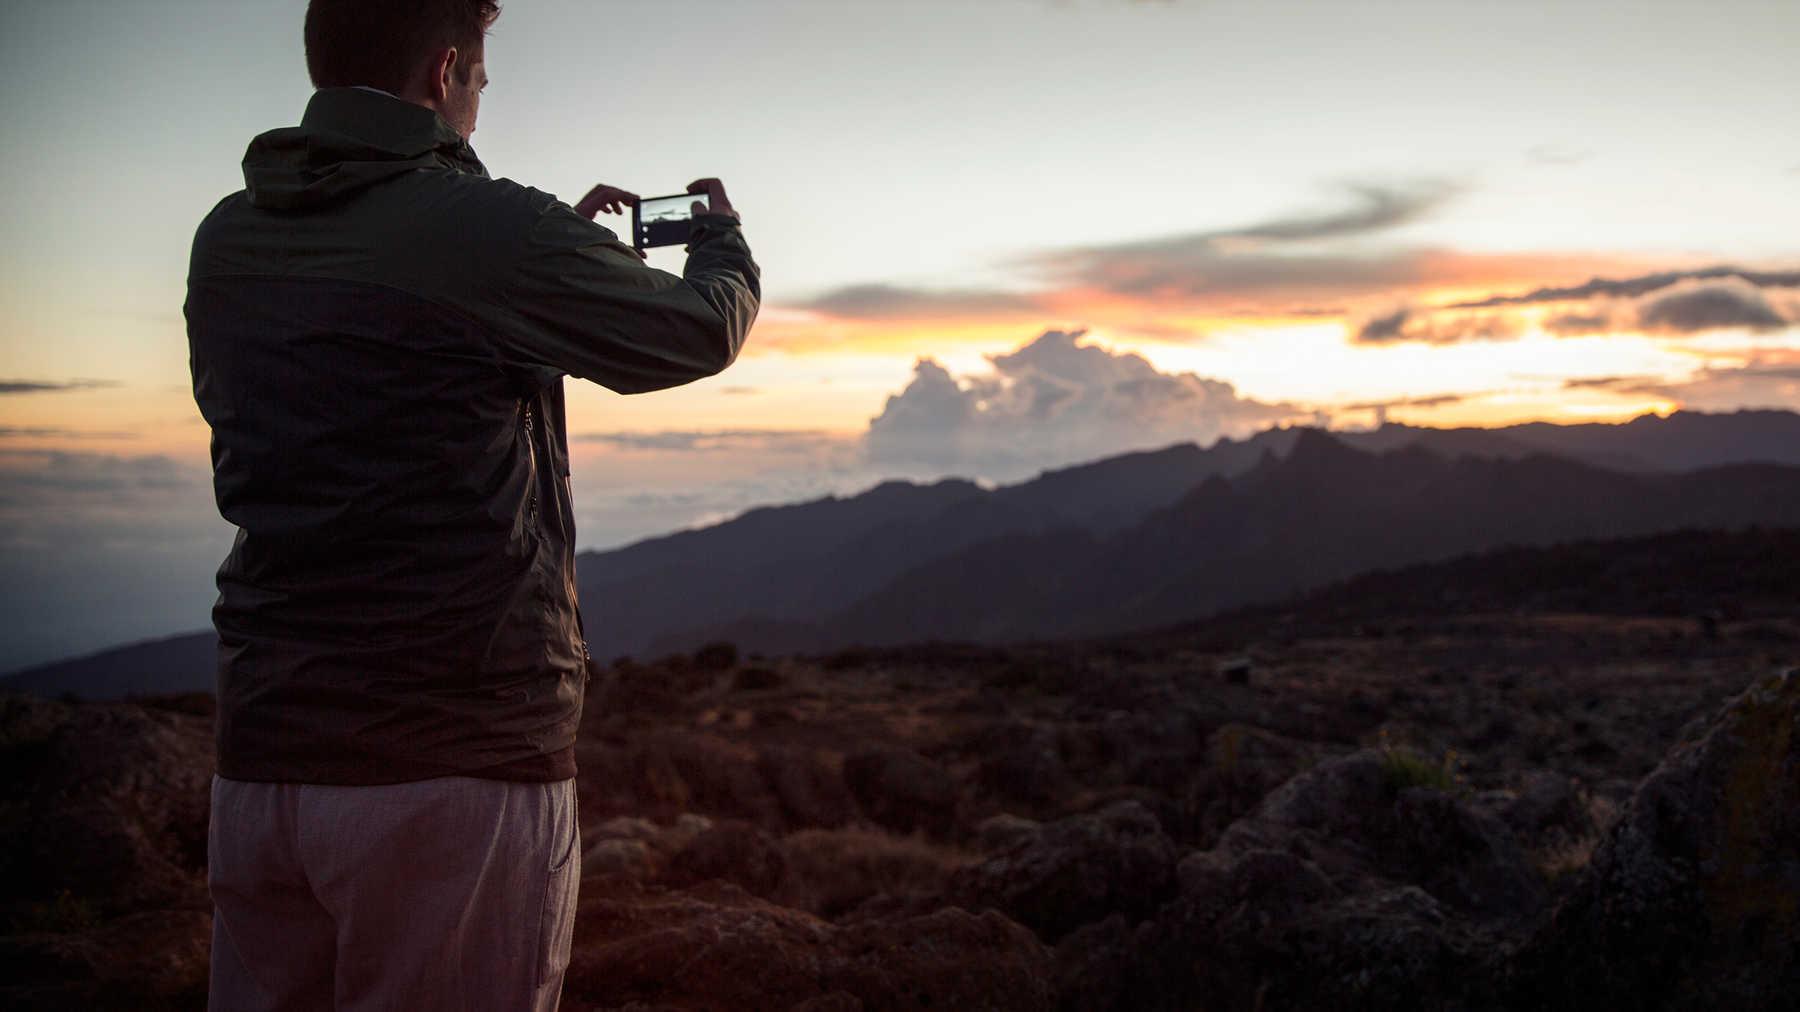 Mt Kilimanjaro Trek - Rongai Route Mt Kilimanjaro, Tanzania